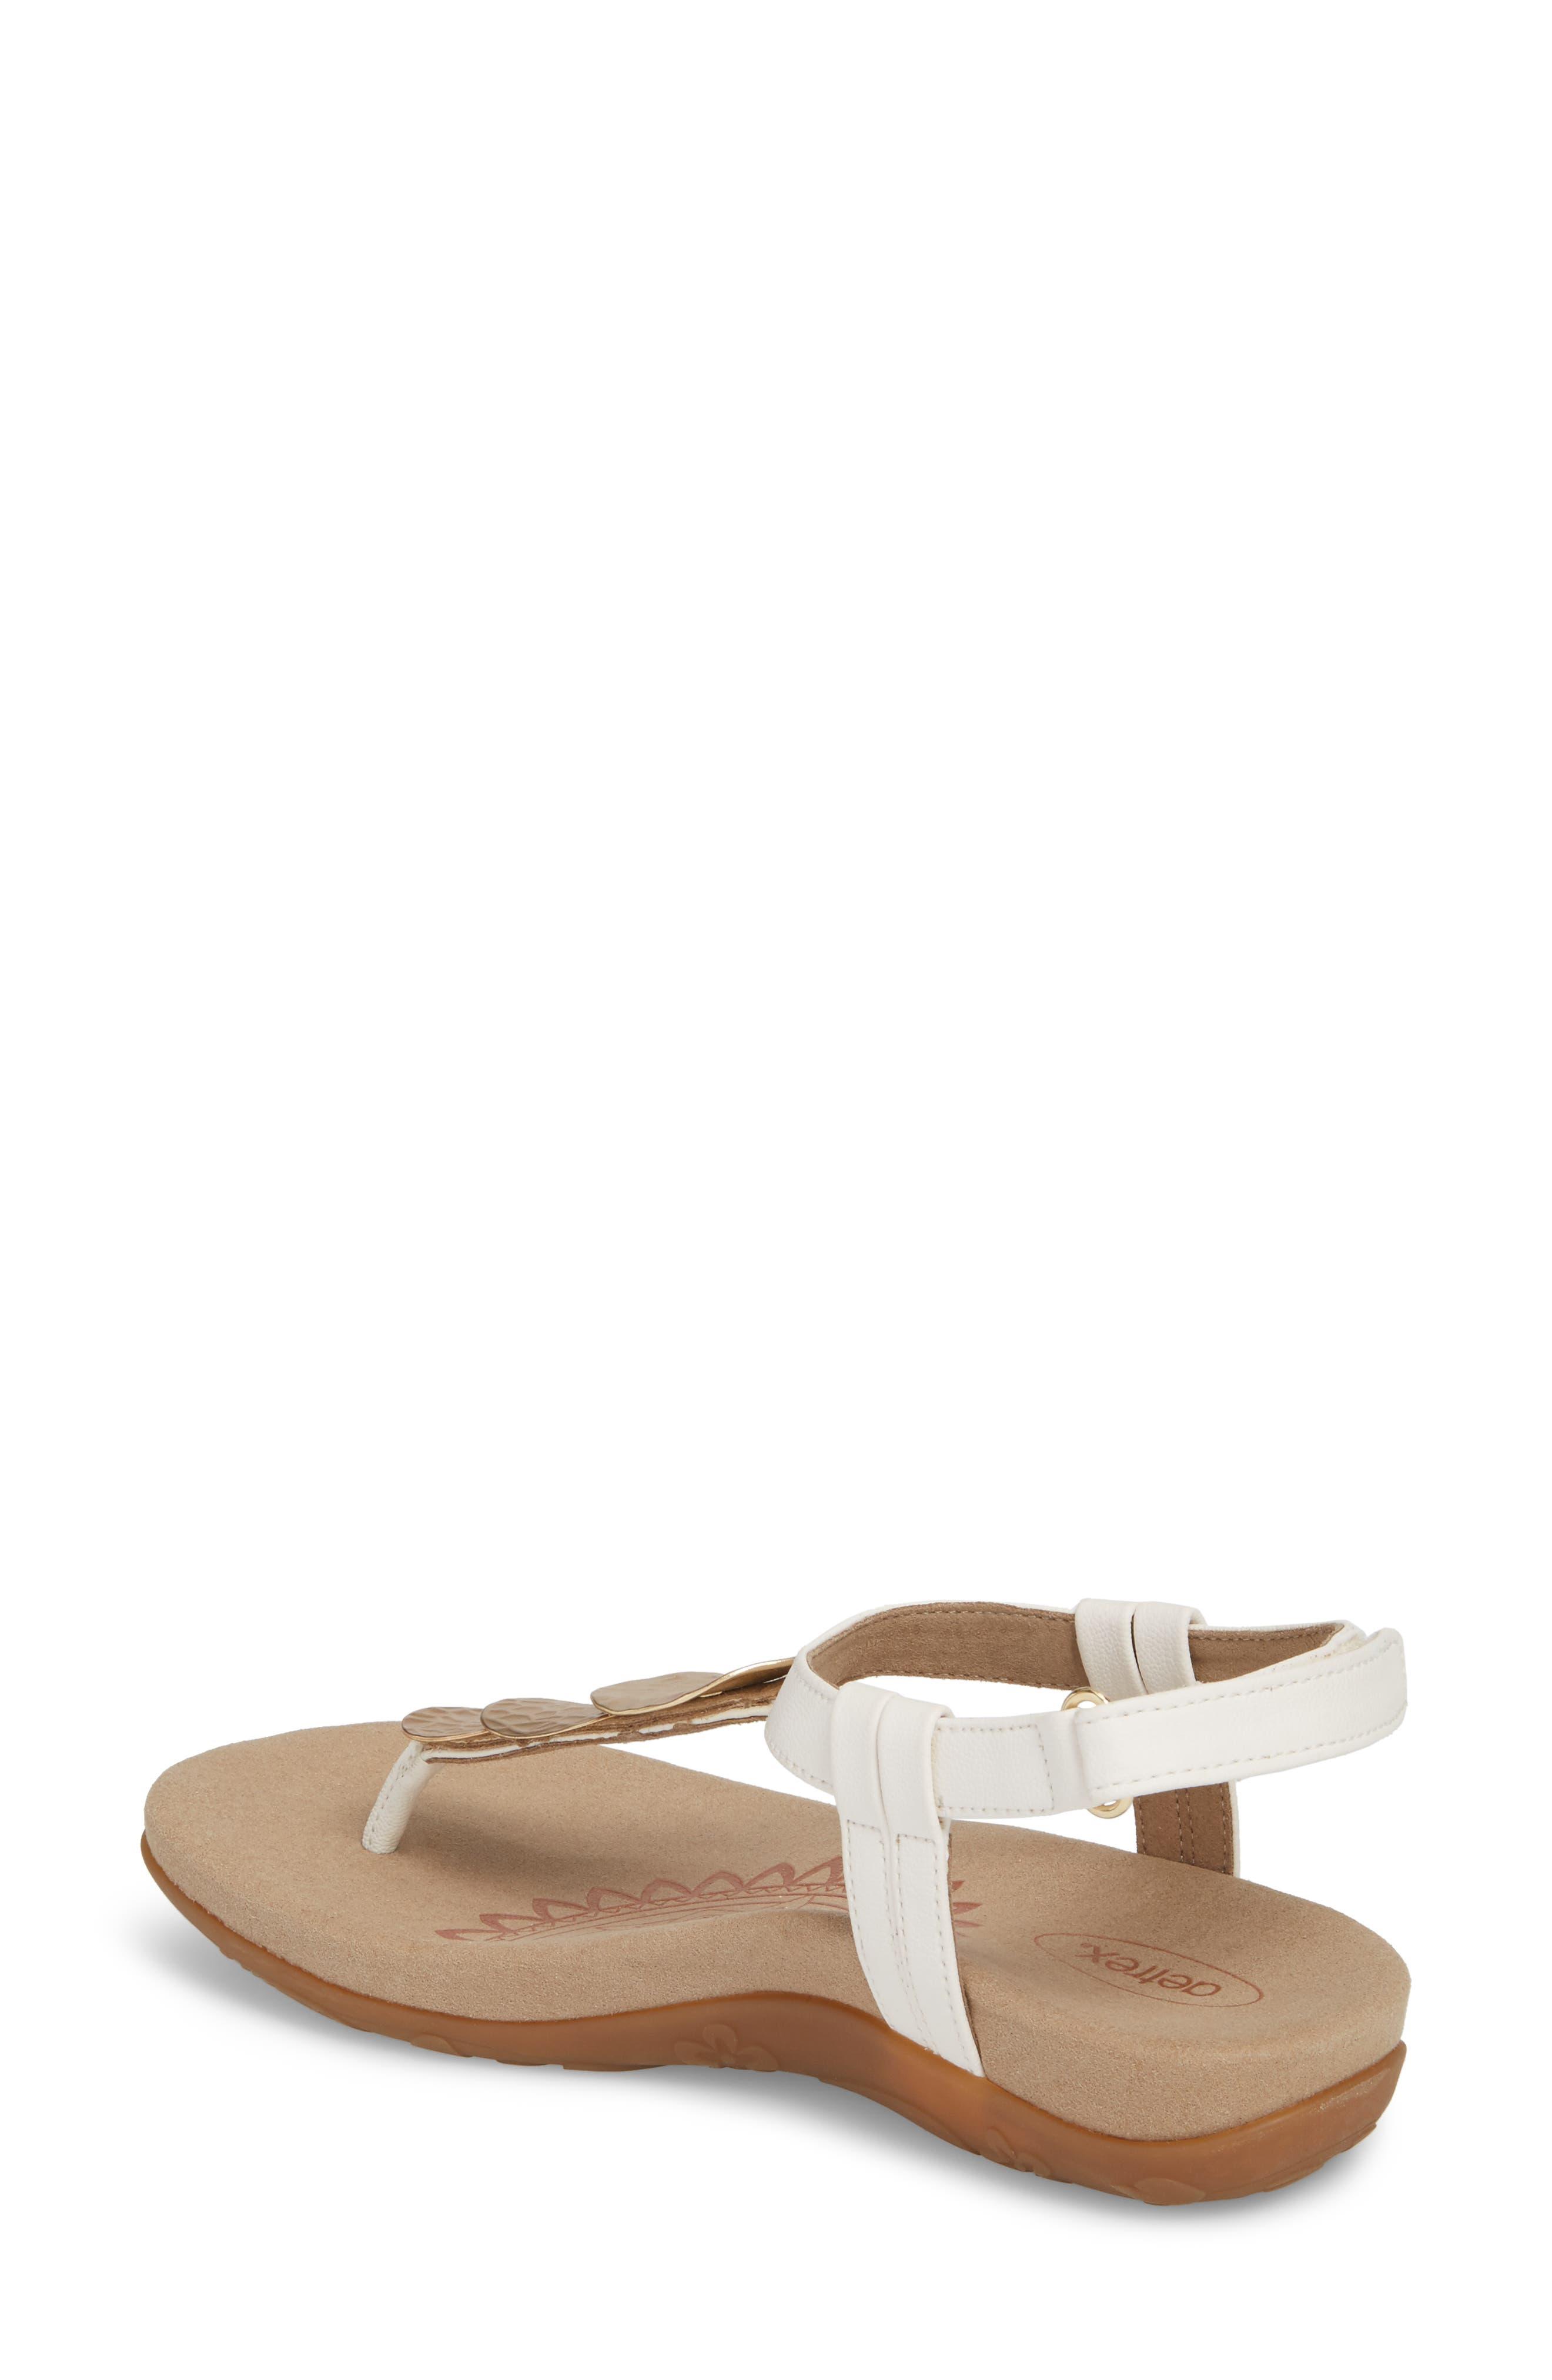 Olive T-Strap Sandal,                             Alternate thumbnail 5, color,